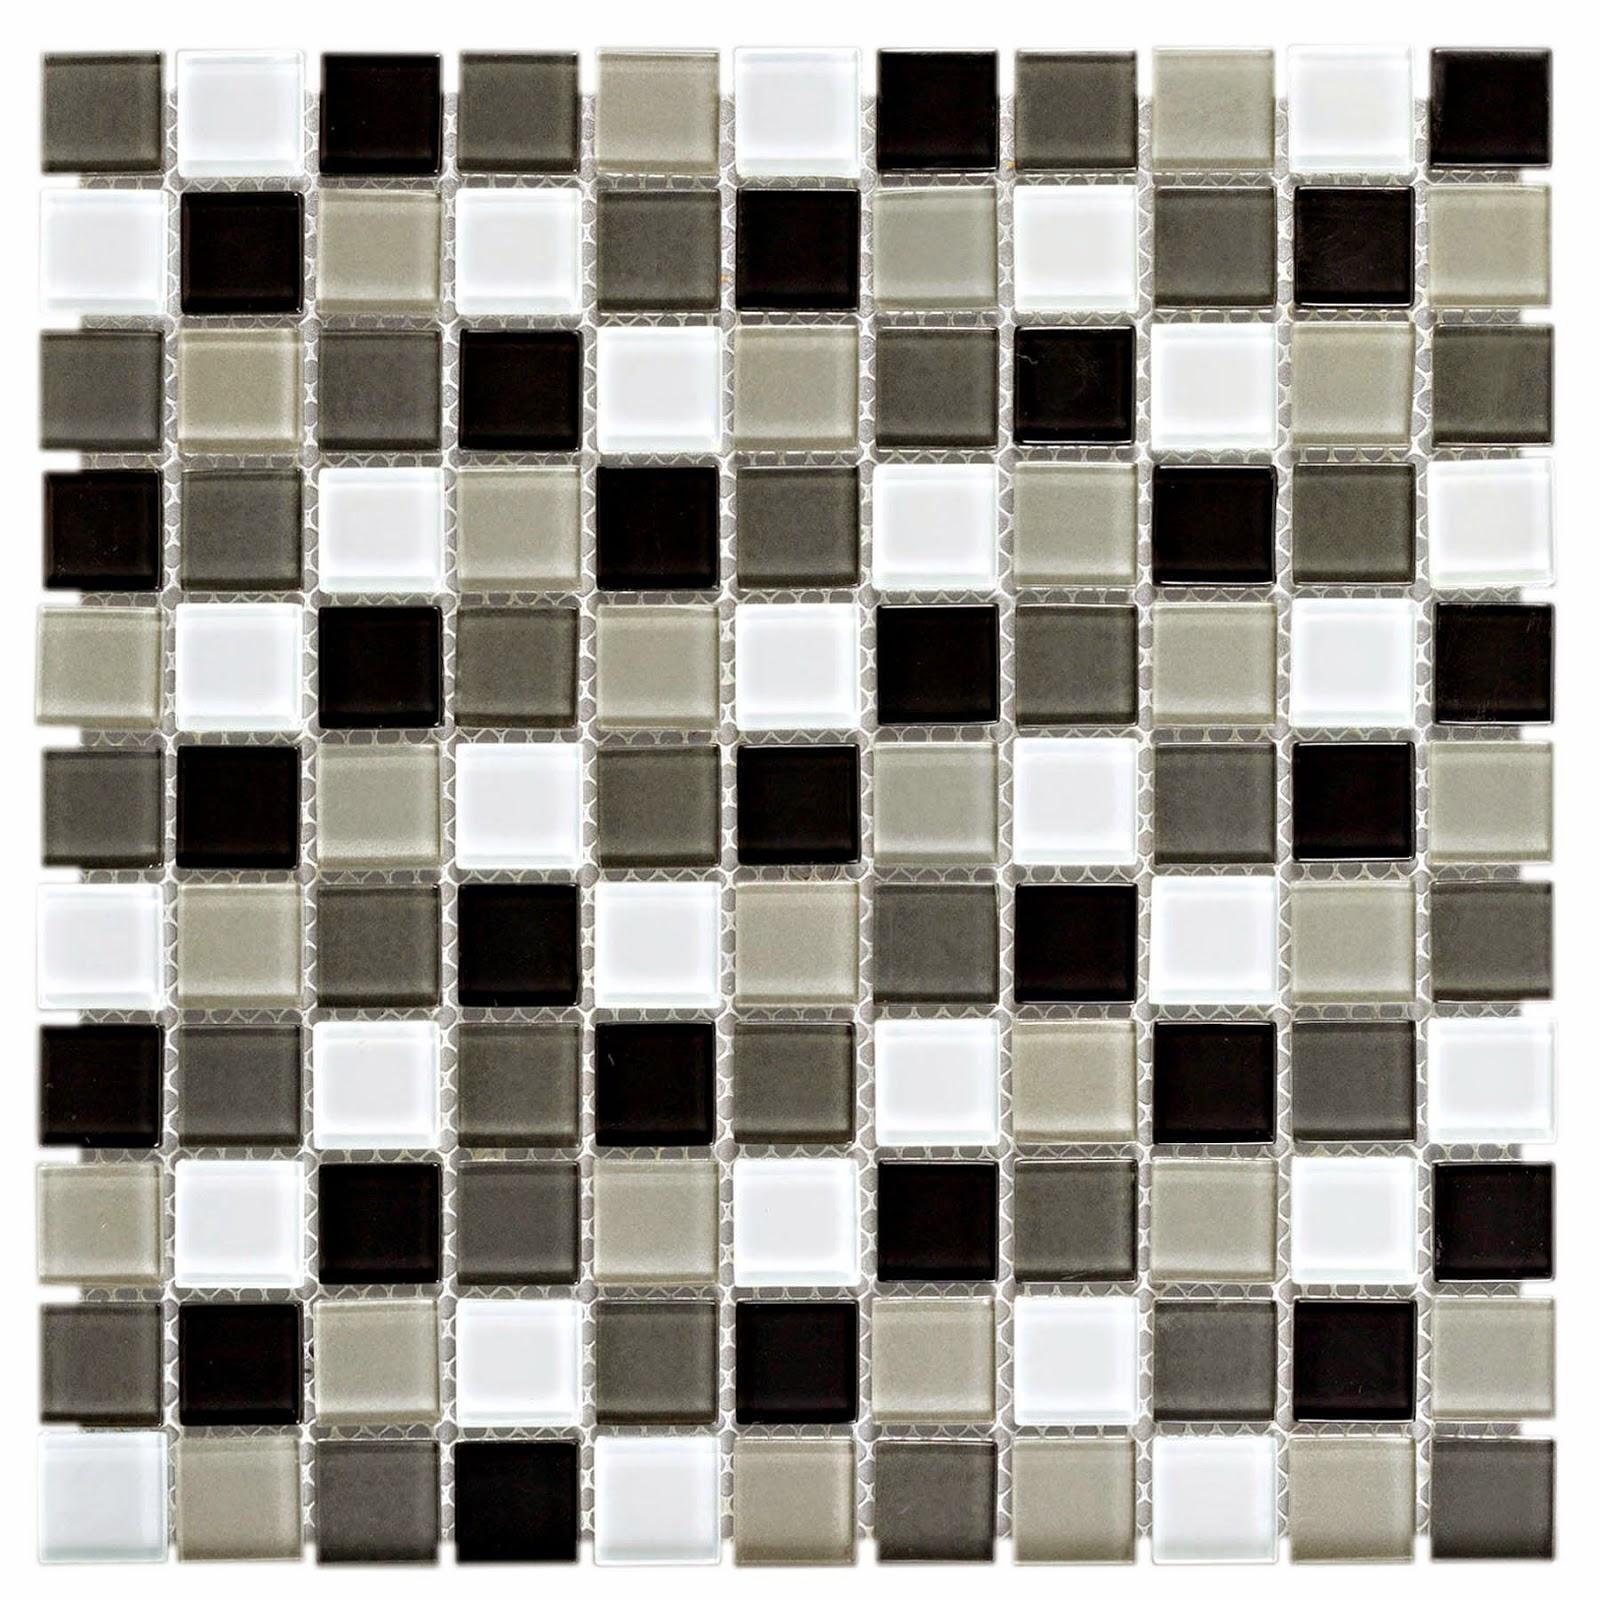 Pastilha de Vidro Mesclada Preto/ Branco e Cinza MIX 04 30x30 Colortil #1A1612 1600x1600 Banheiro Com Pastilha Branca E Preta